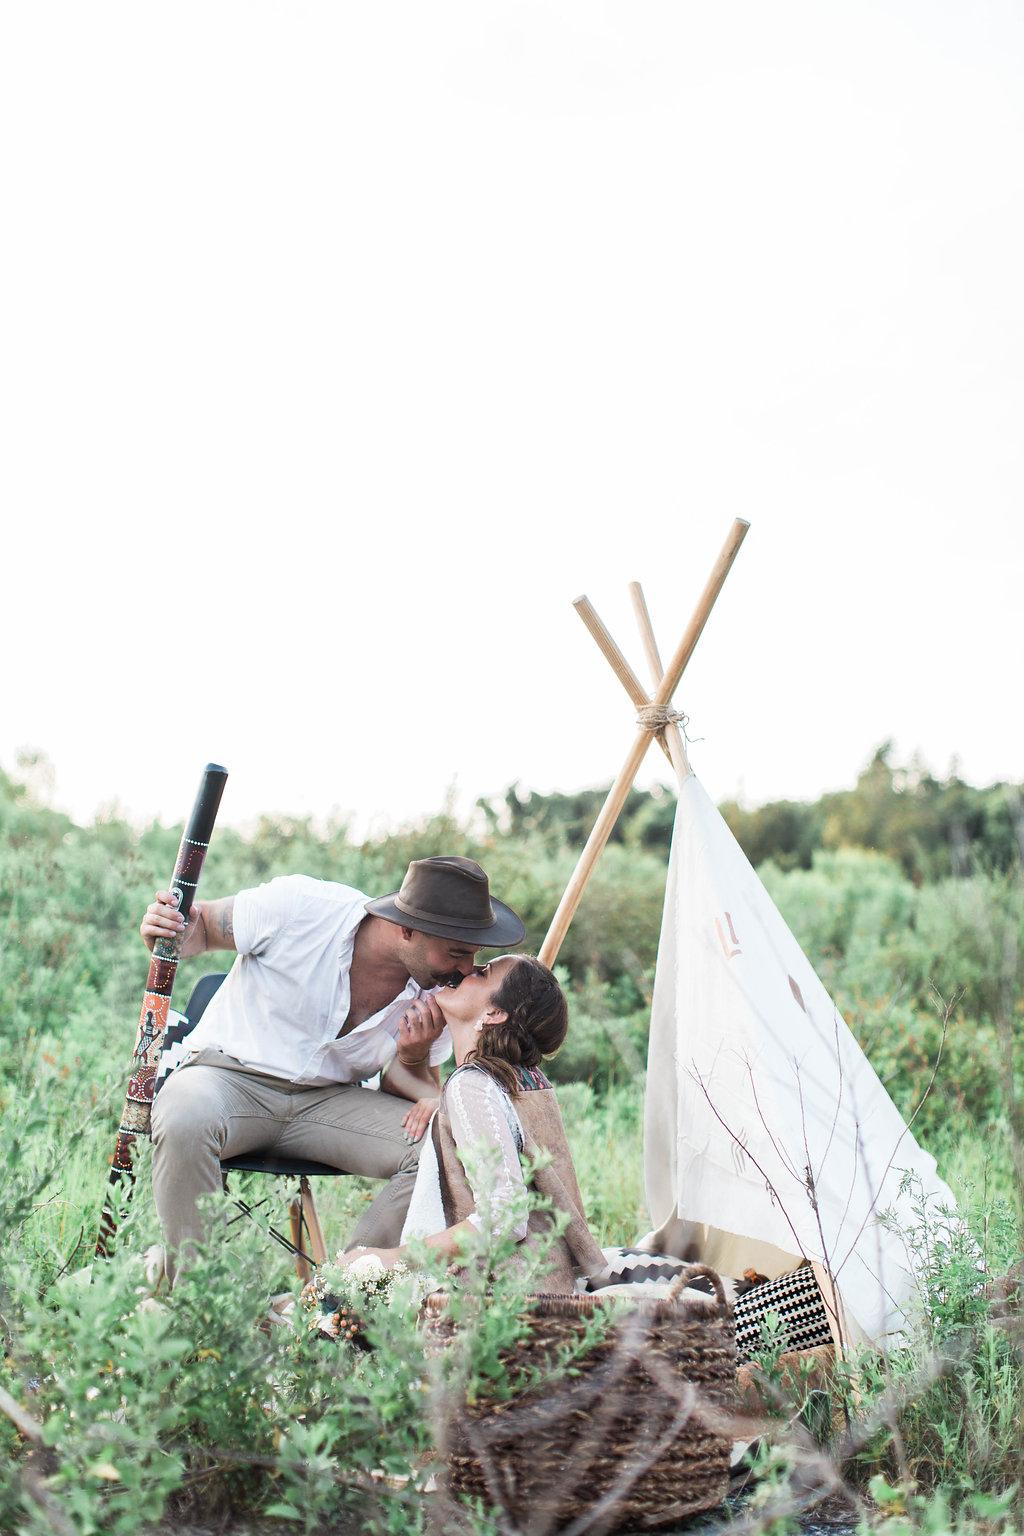 apt-b-photography-ivory-and-beau-bridal-boutique-anna-campbell-isobelle-australian-wedding-the-collins-quarter-savannah-wedding-savannah-weddings-savannah-florist-savannah-bridal-savannah-event-designer-savannah-wedding-dresses-outback-wedding-35.jpg